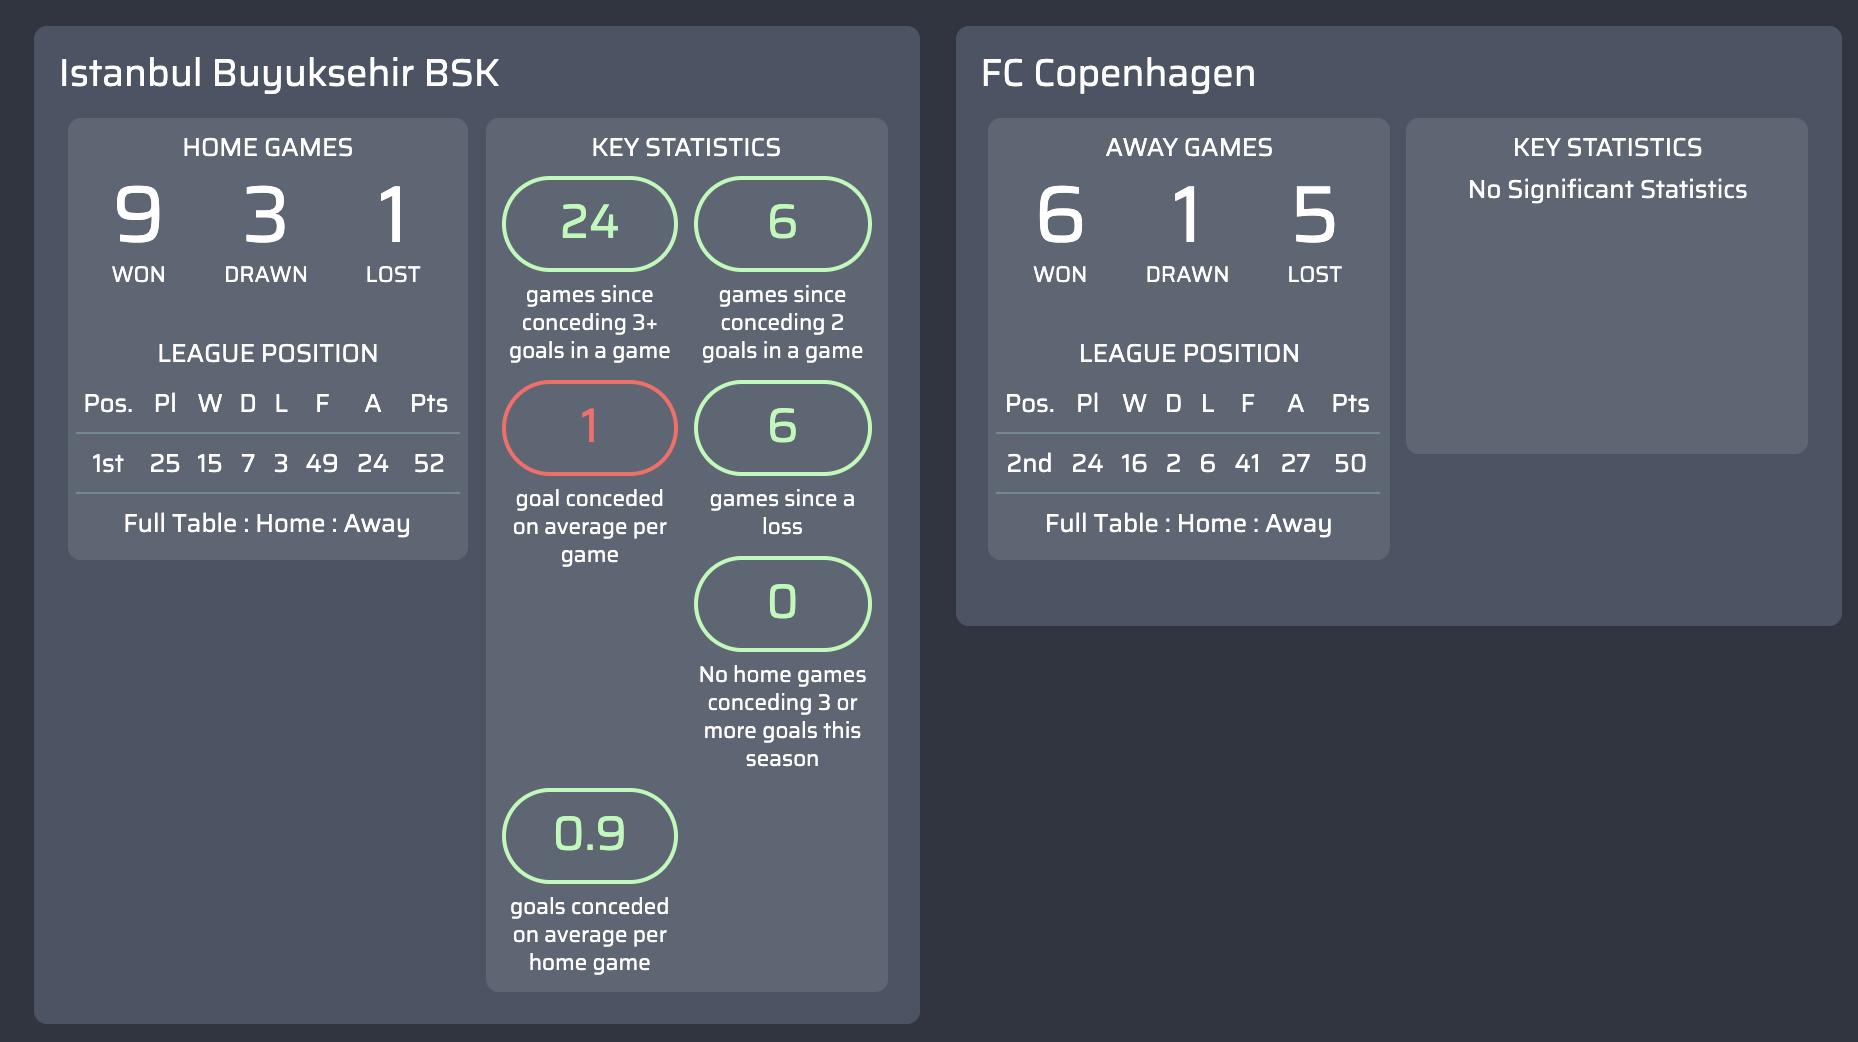 máy tính dự đoán Istanbul Buyuksehir BSK v FC Copenhagen